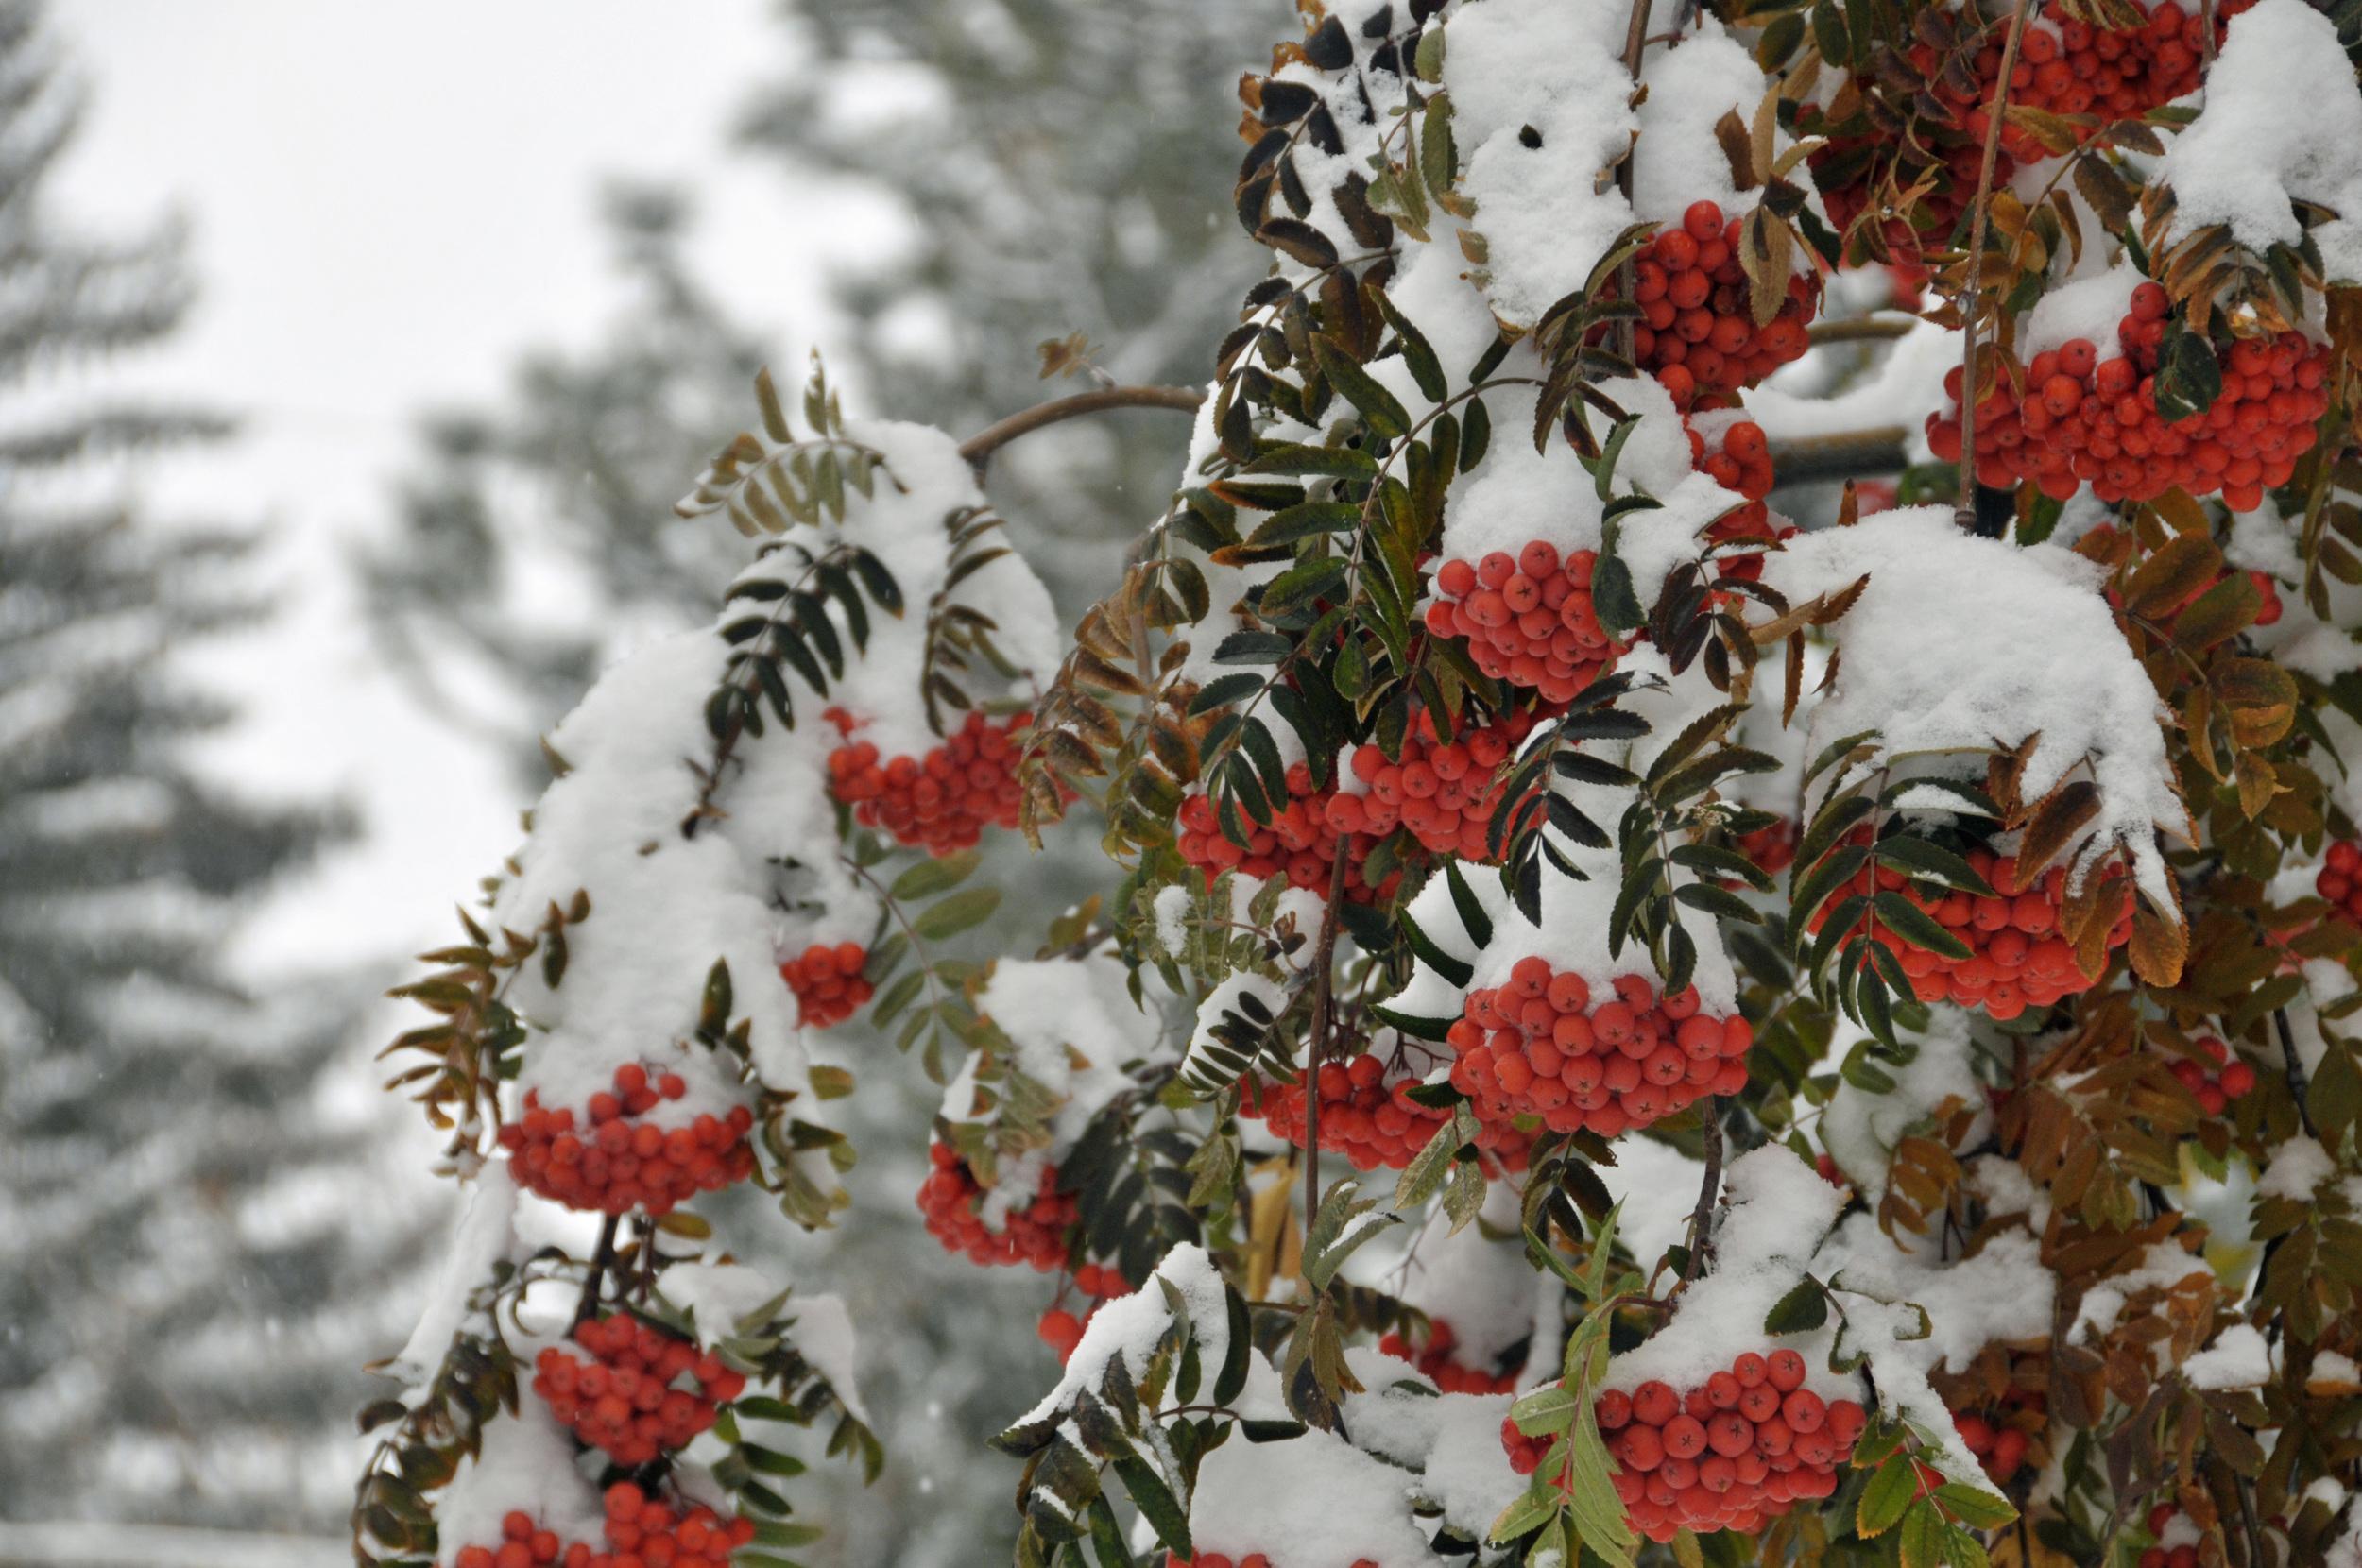 November 13 Snow (41)